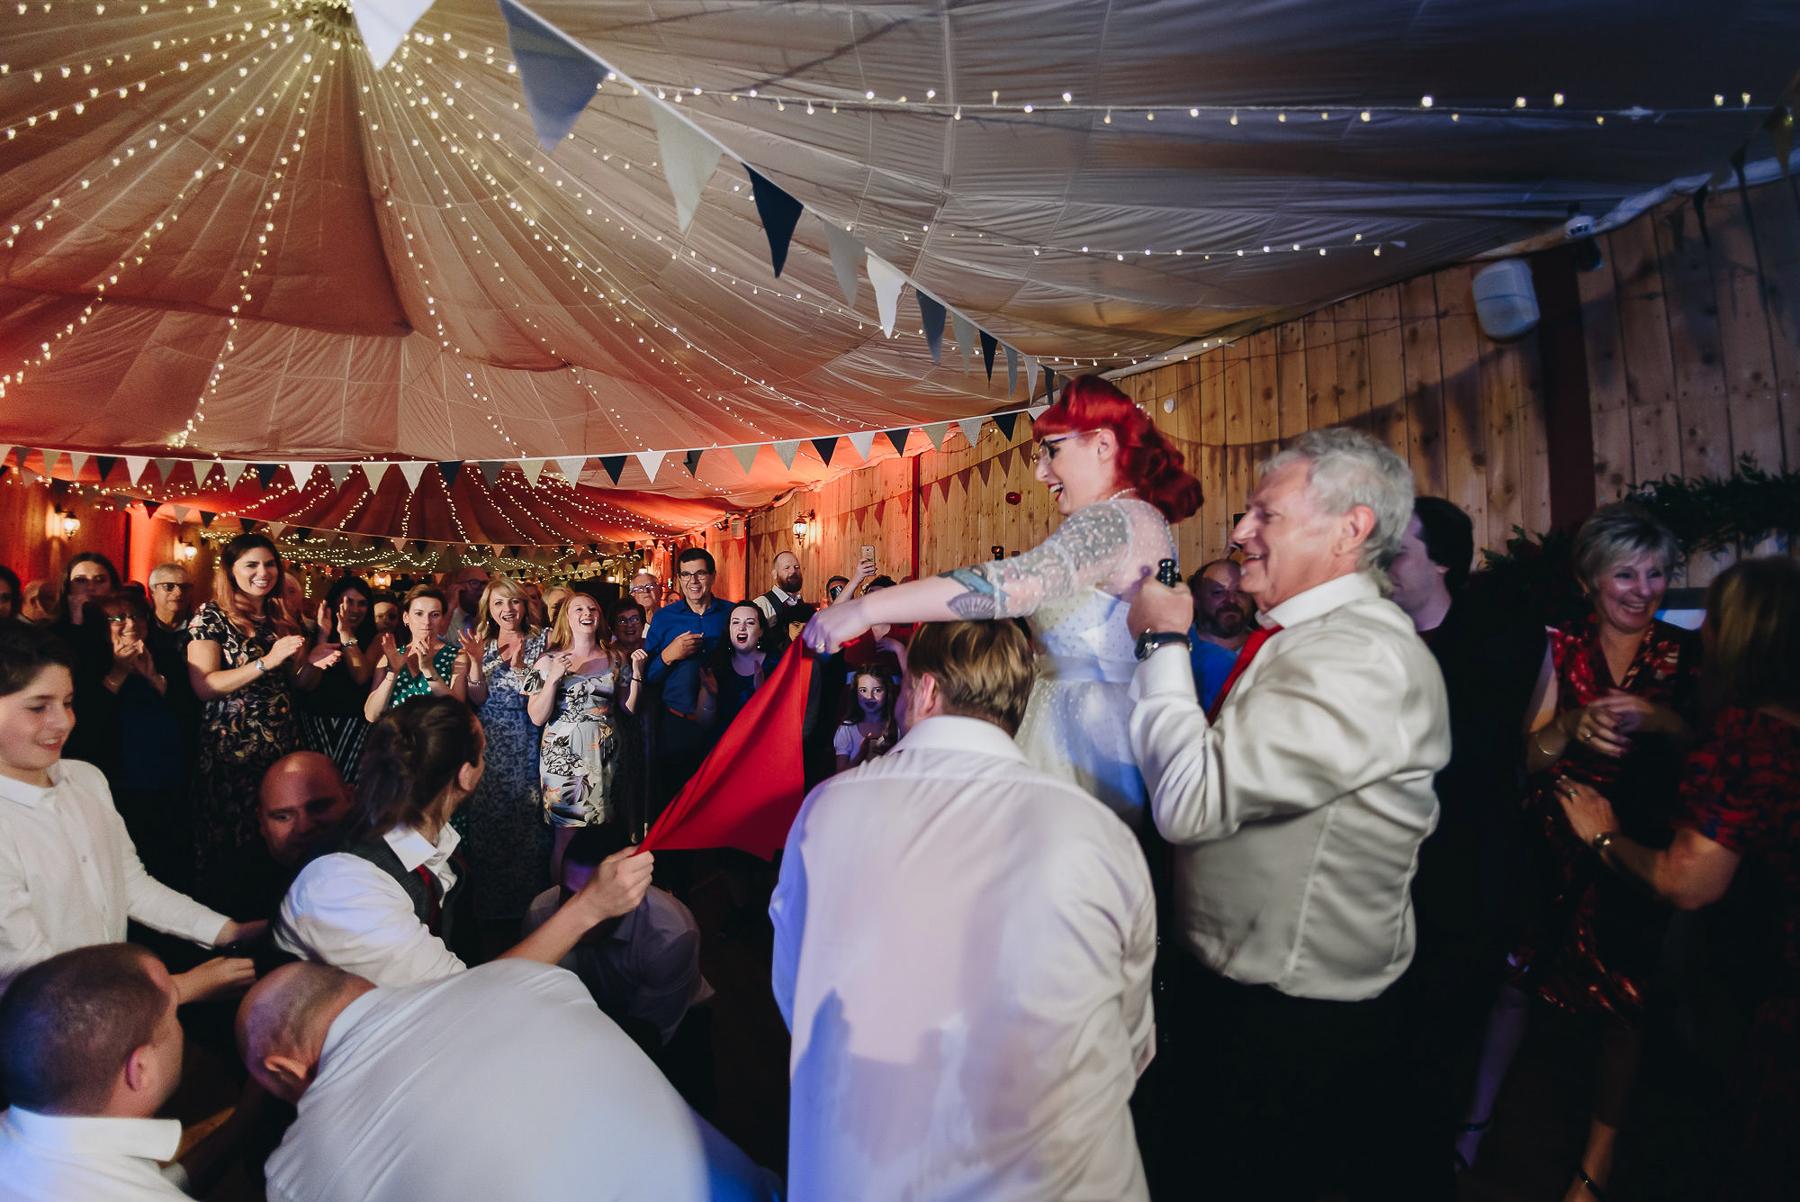 Wellbeing_Farm_Wedding_Photography_The_Pin-Up_Bride_Lara_Shaun-173.jpg